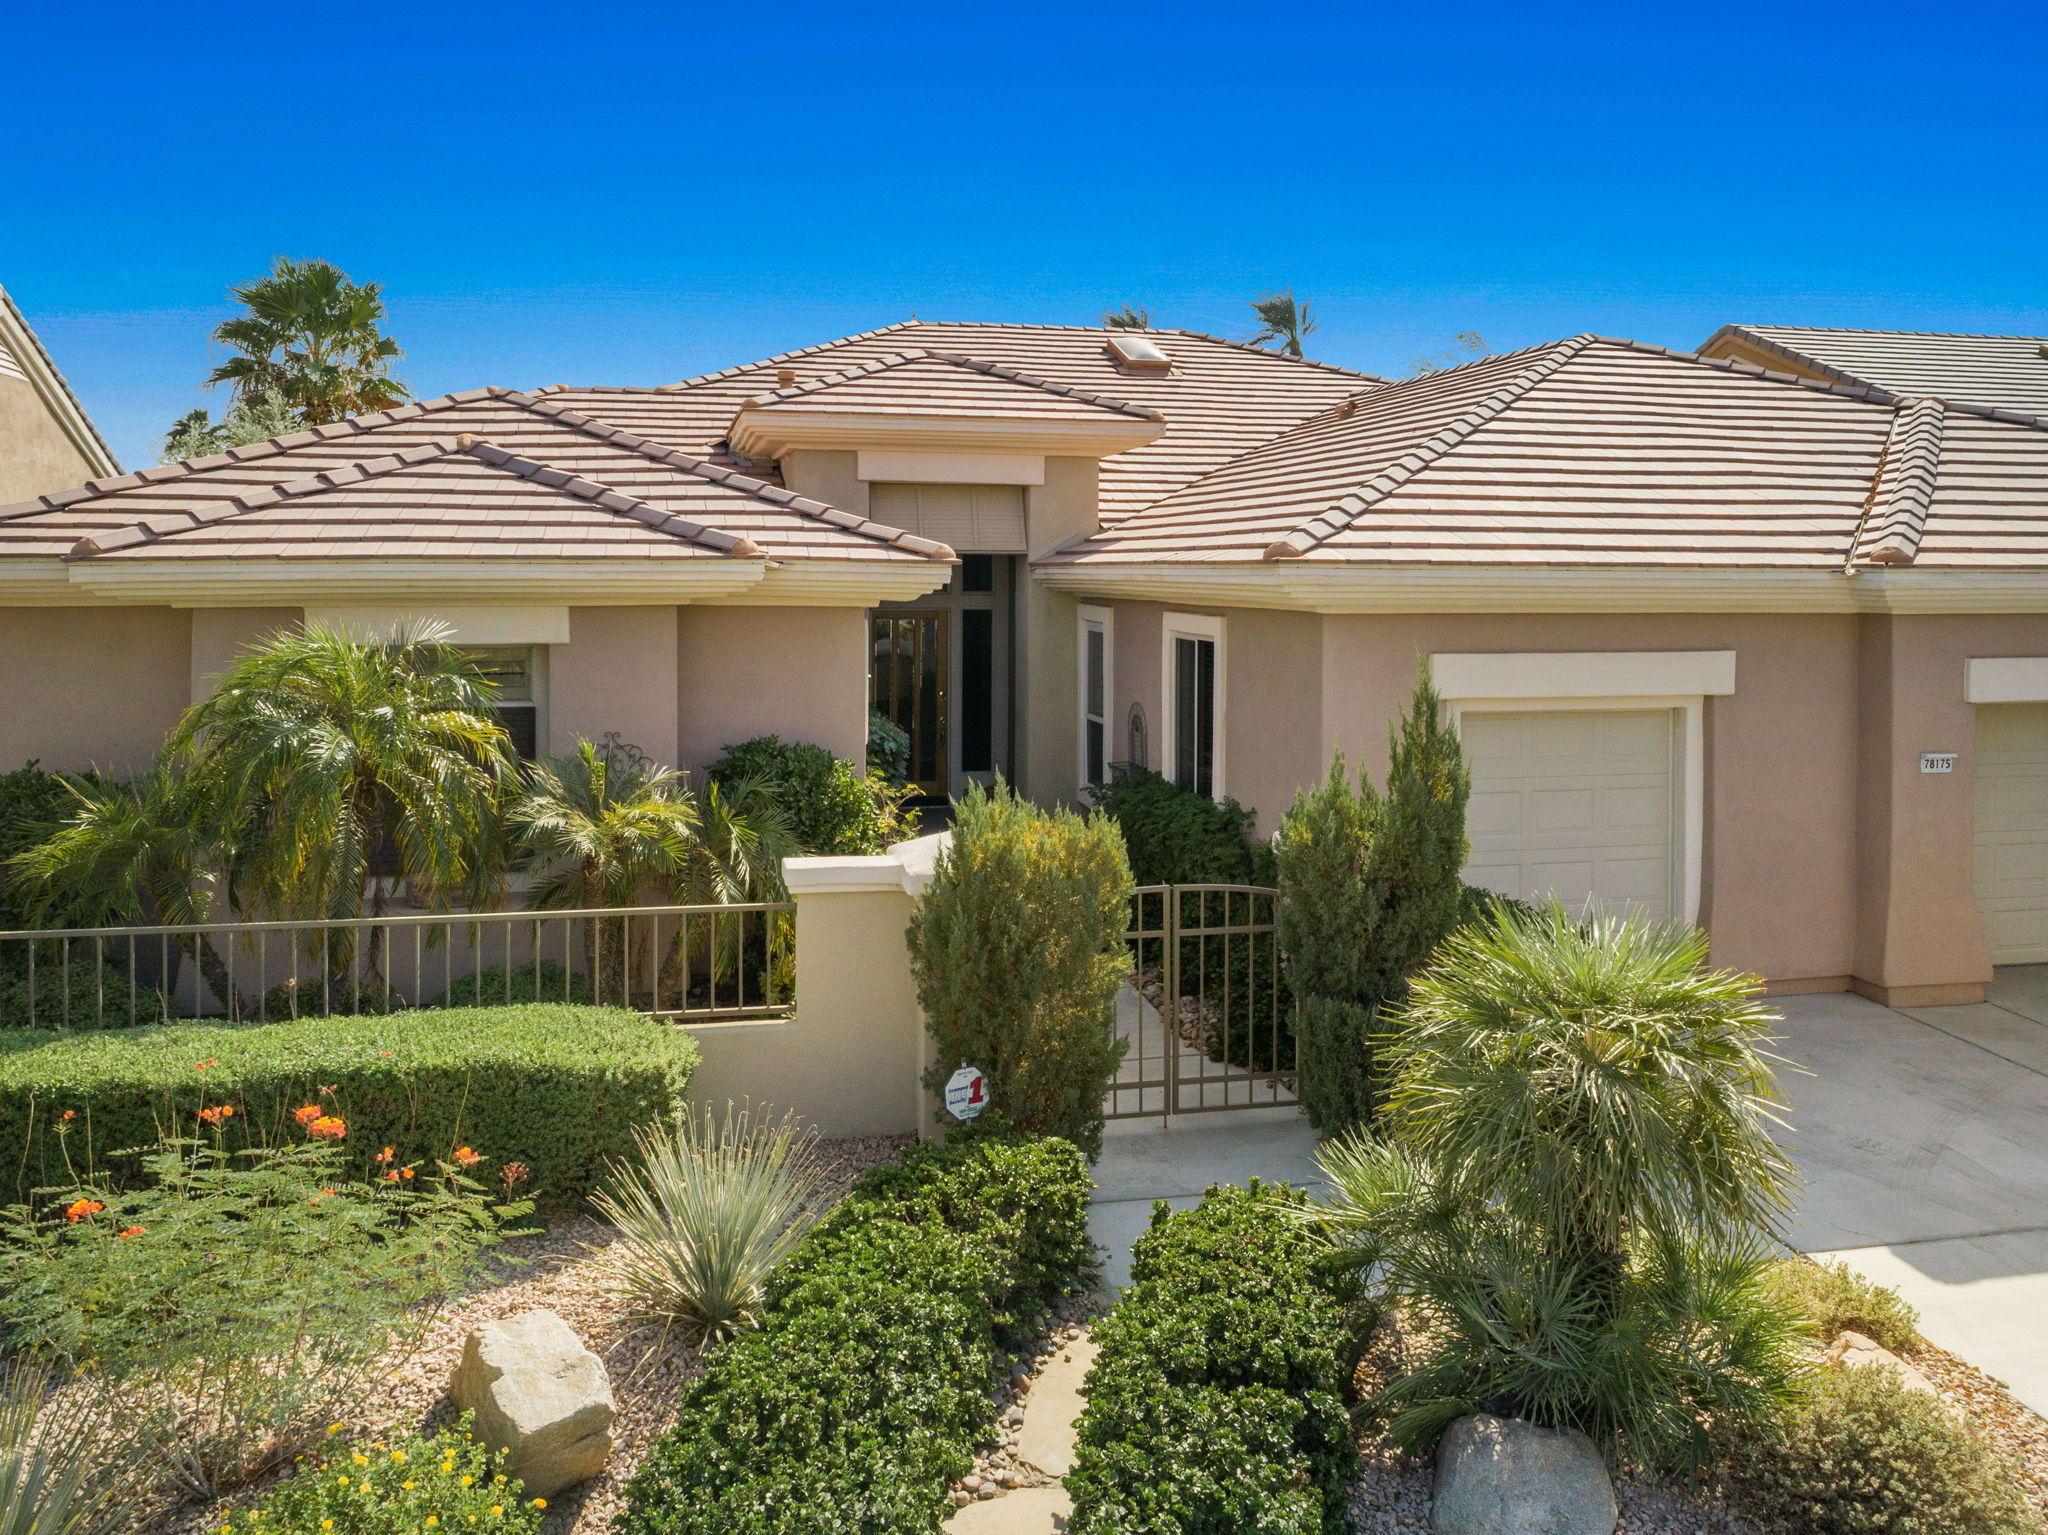 Photo of 78175 Sunrise Canyon Avenue, Palm Desert, CA 92211